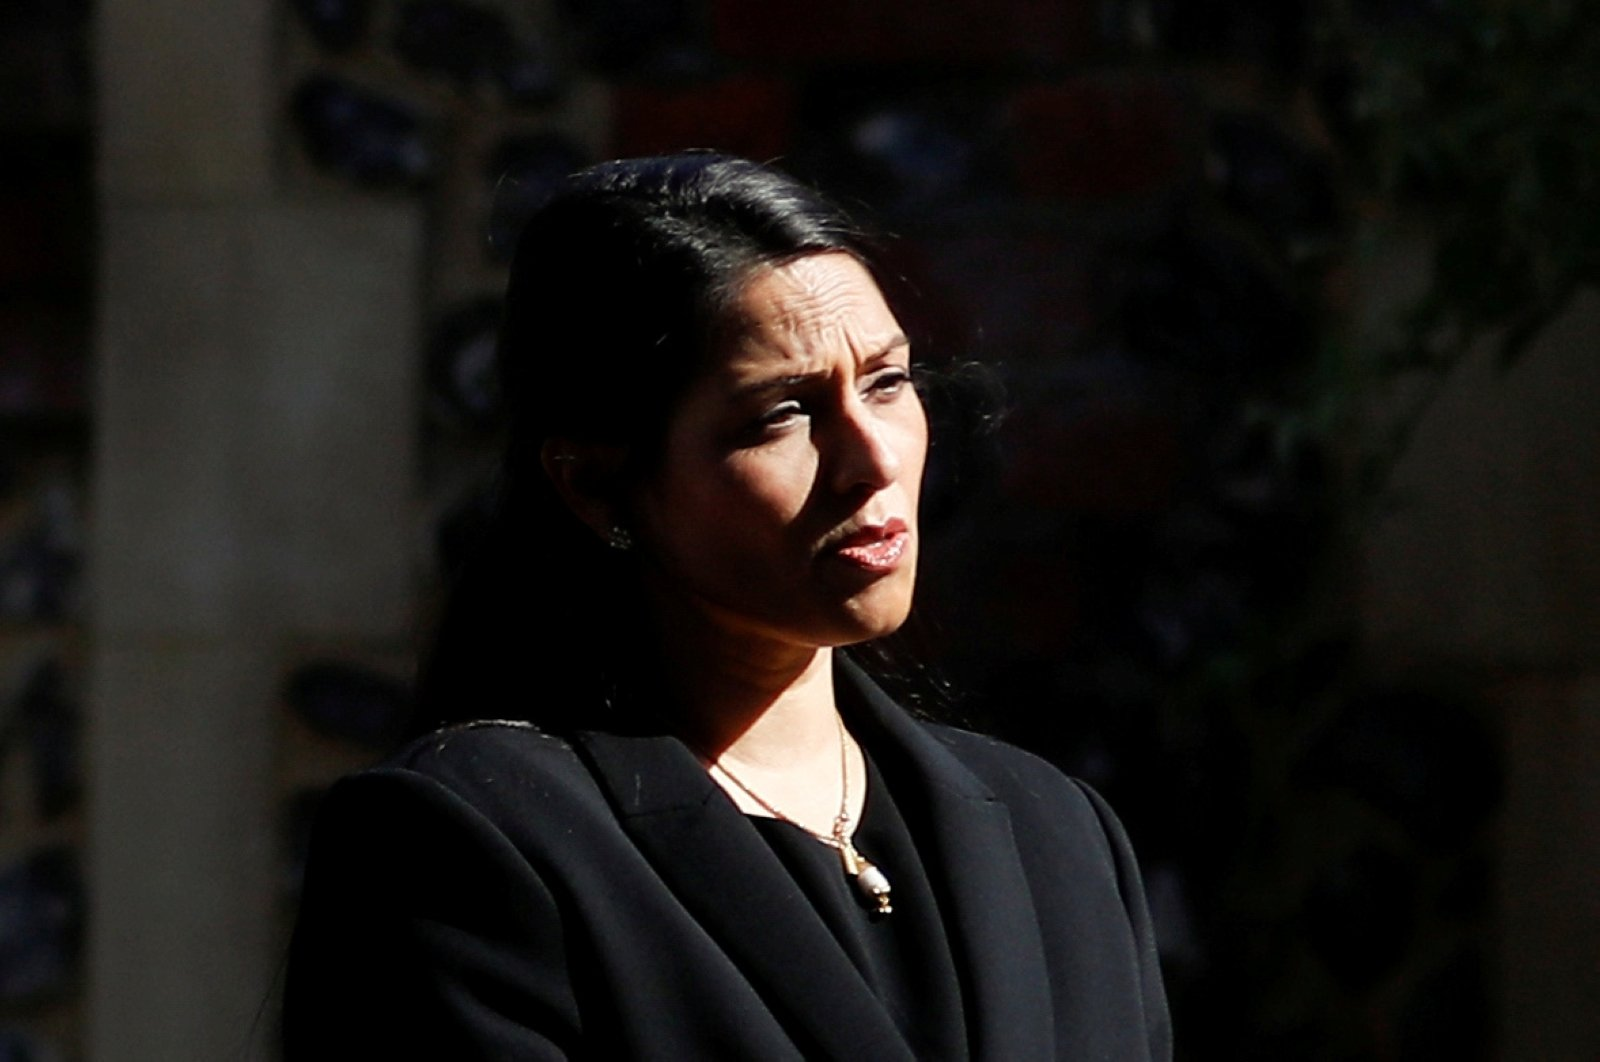 Britain's home secretary Priti Patel speaks to the media in Reading, Britain, June 22, 2020. (Reuters Photo)